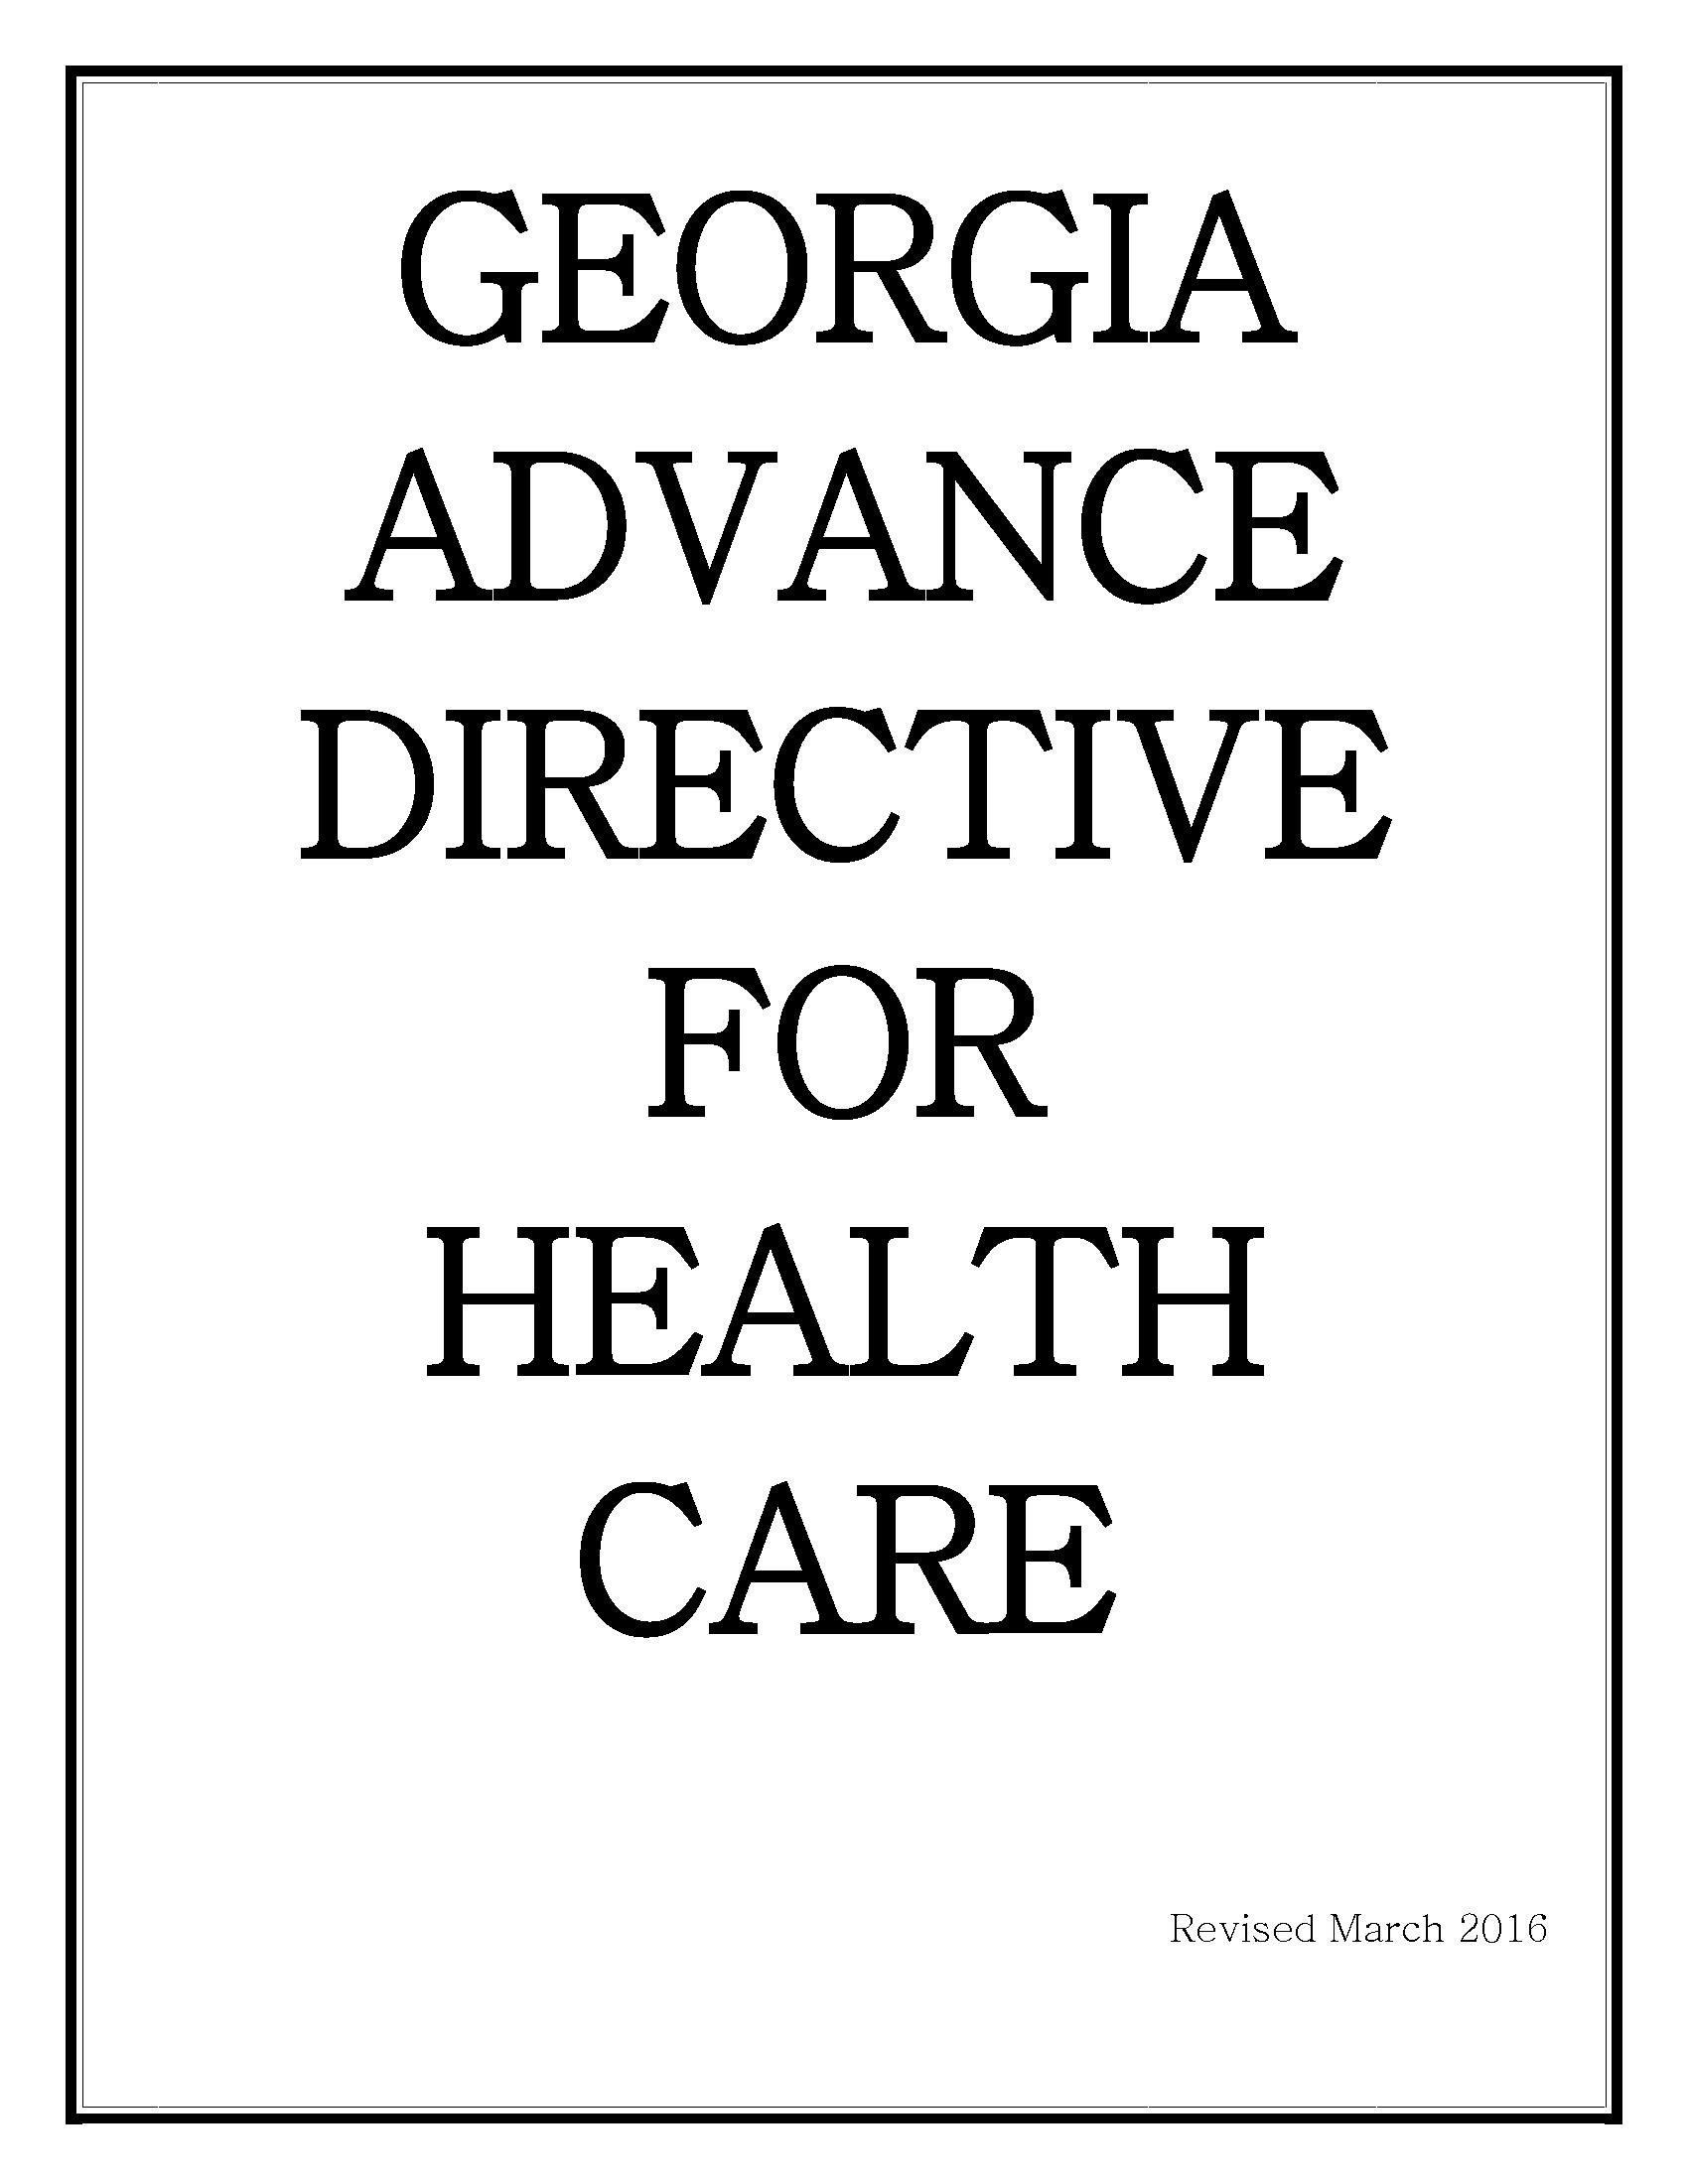 Georgia Advance Directive For Health Care